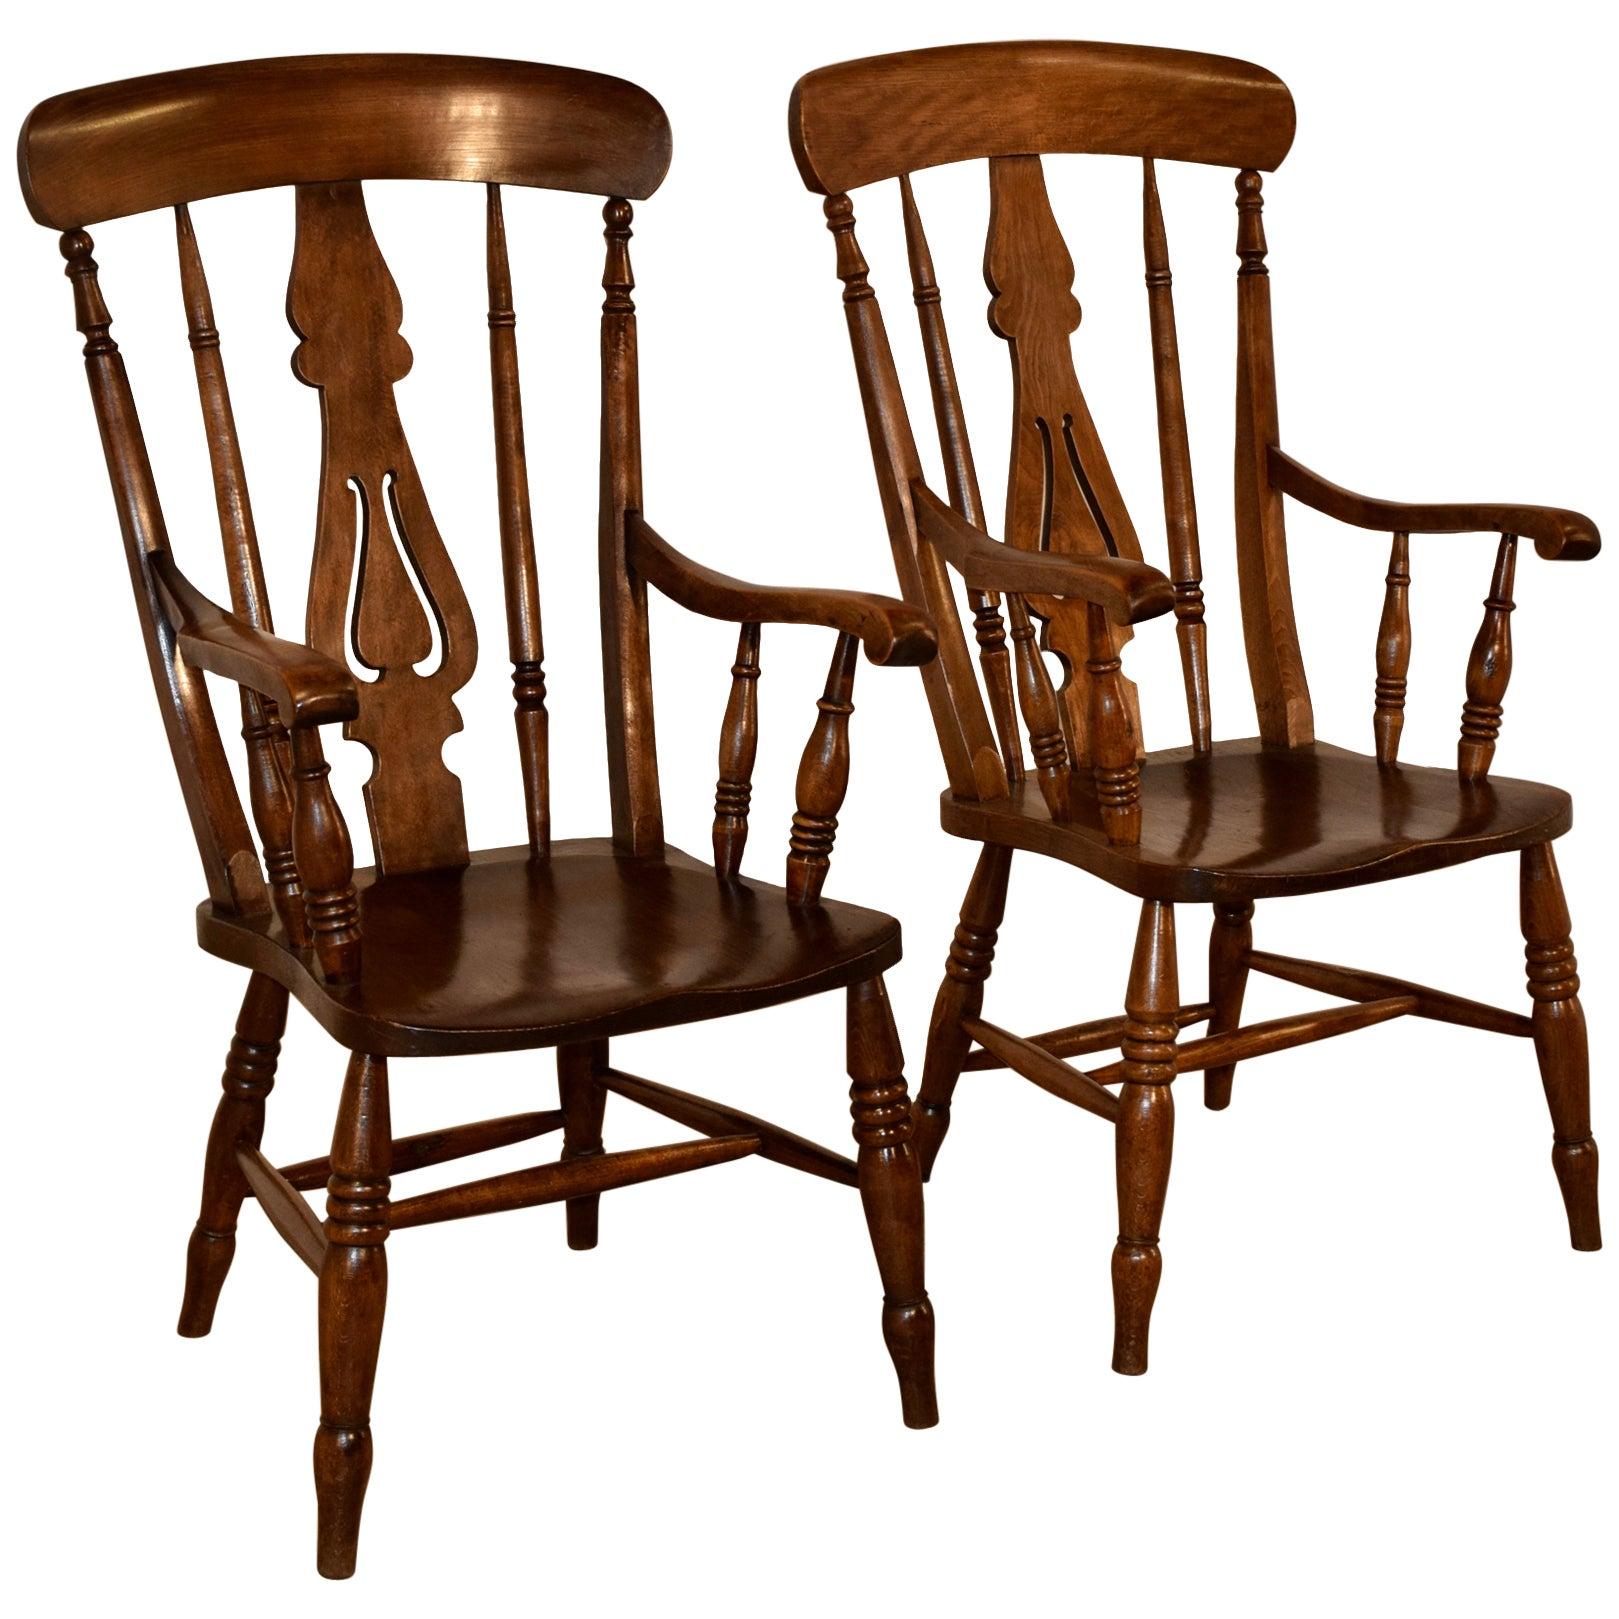 19th Century Pair of Lancashire Ladder Back Armchairs